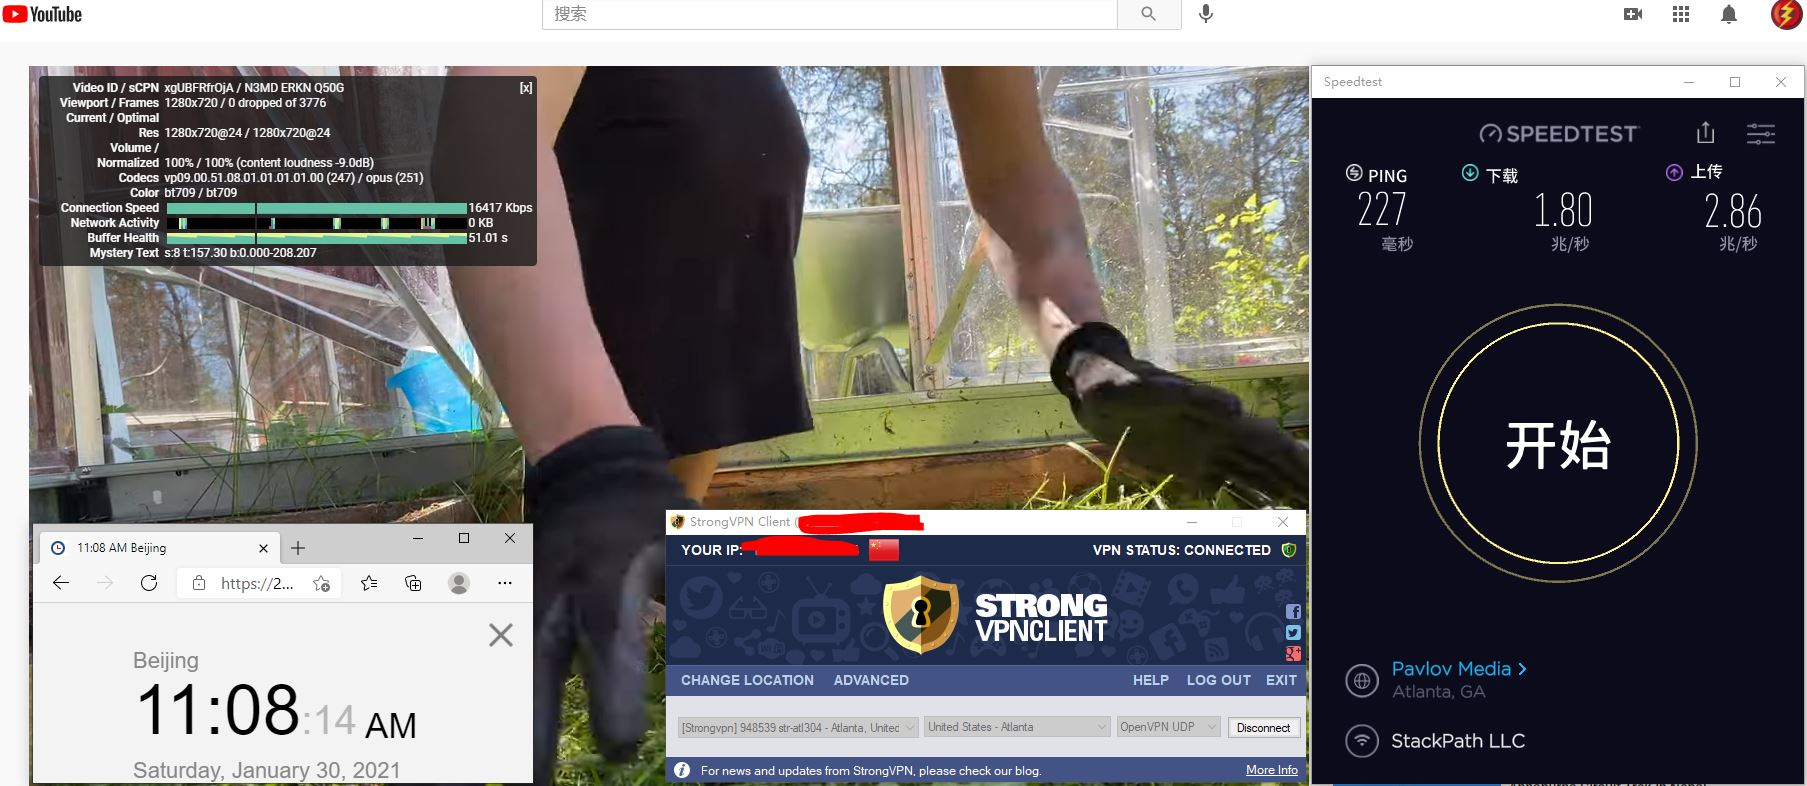 Windows10 StrongVPN 默认协议 USA - Atlanta 服务器 中国VPN 翻墙 科学上网 10BEASTS Barry测试 - 20210130